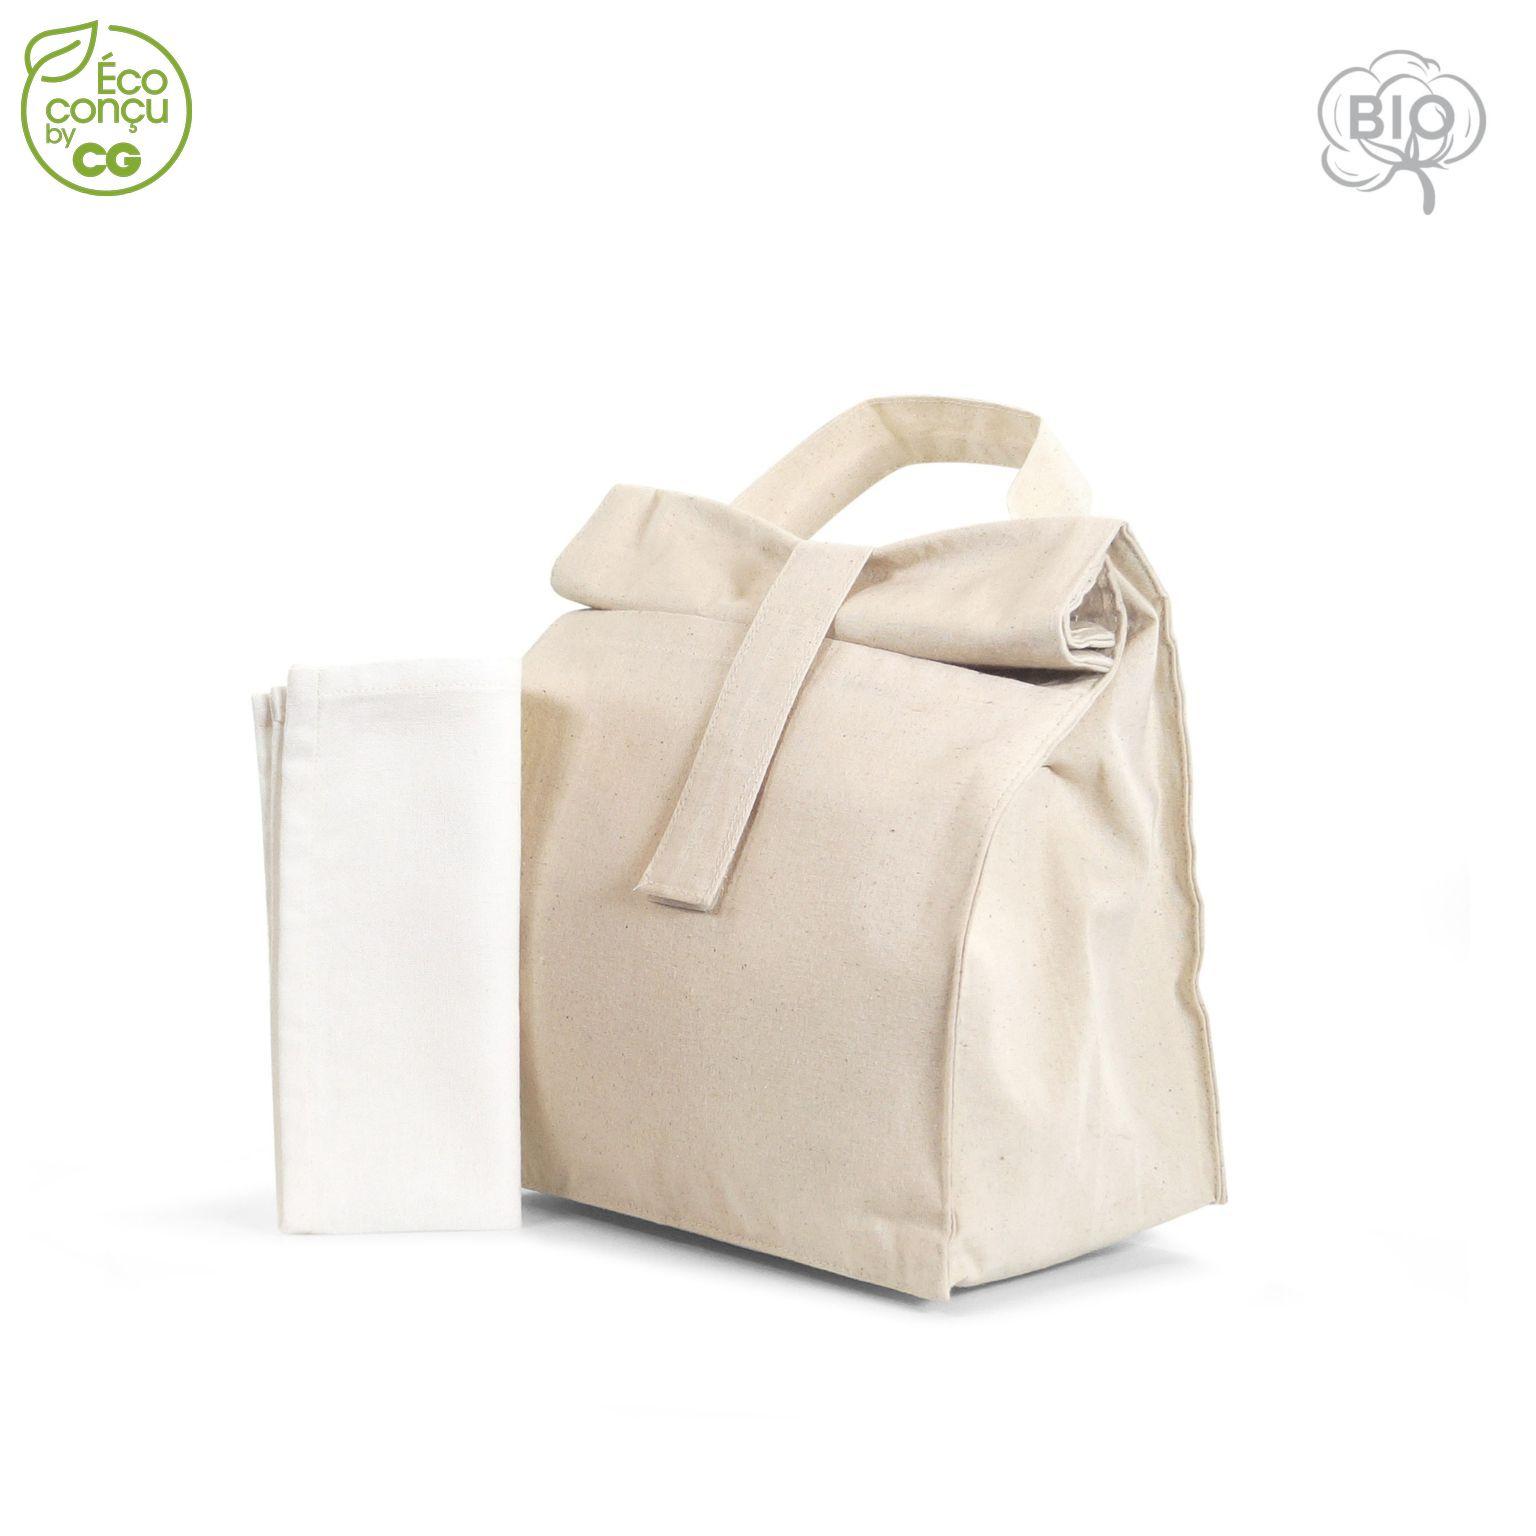 Lunch bag BIOLUNCH